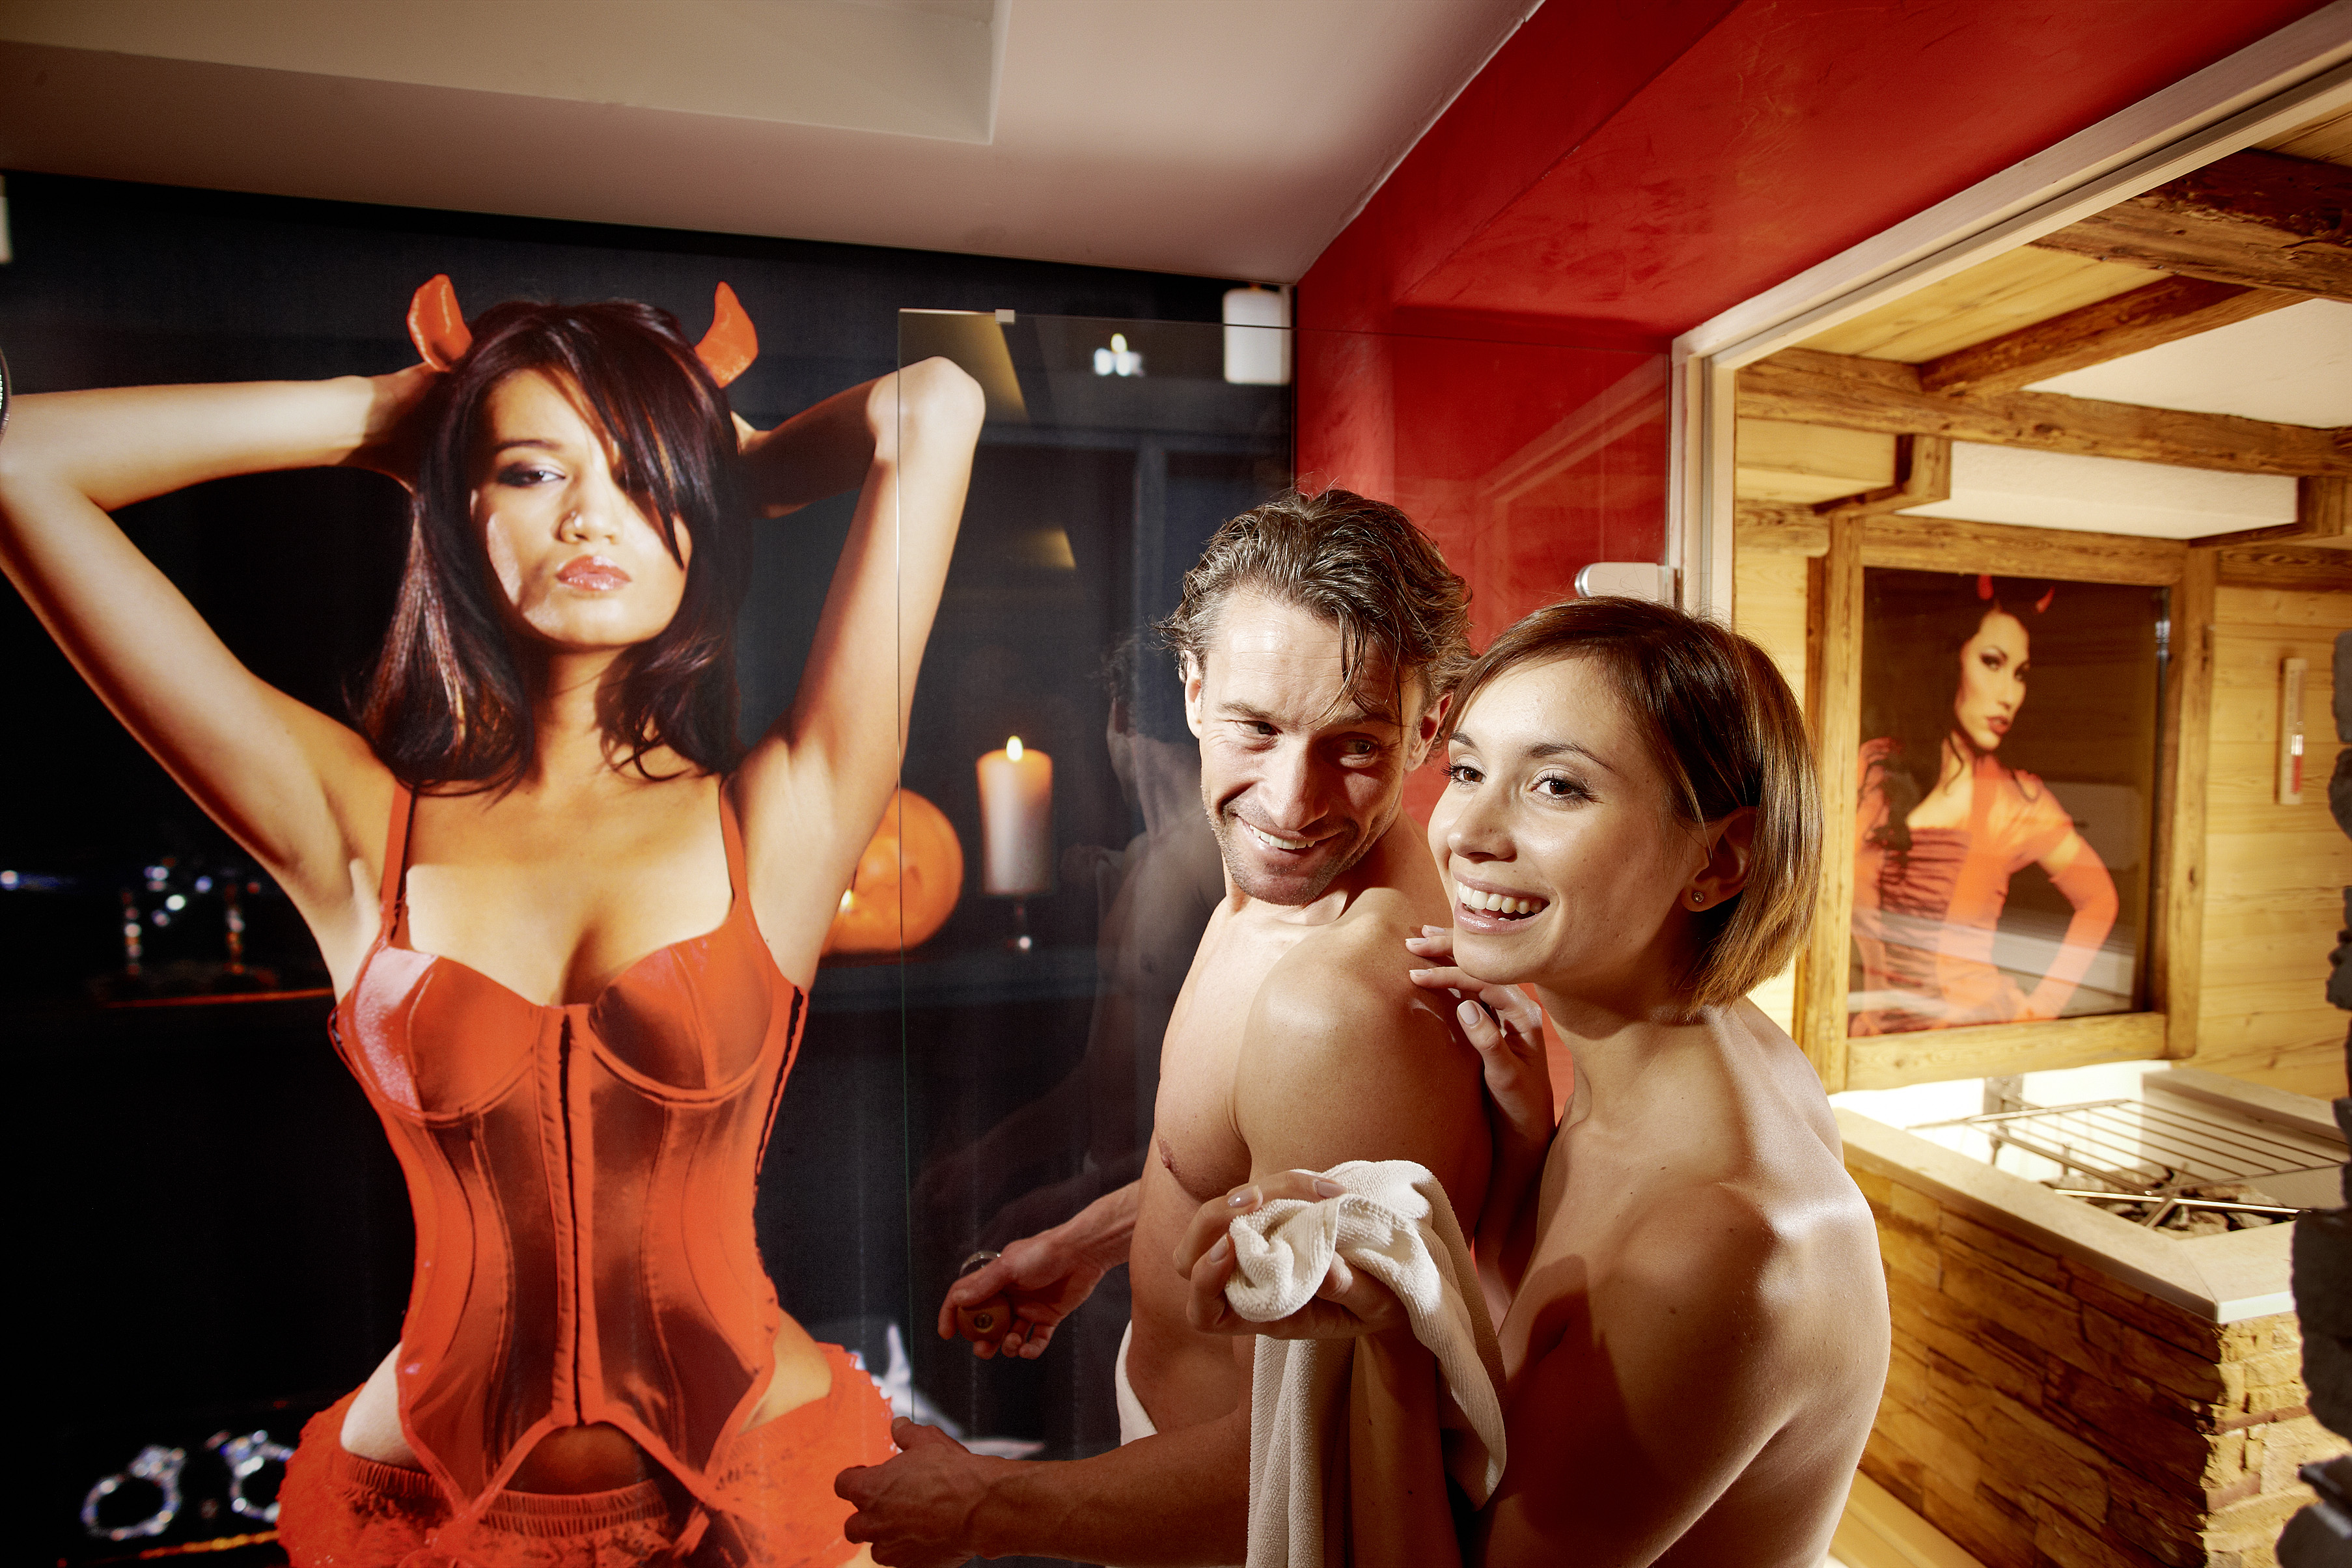 sexiga kvinnor stockholm sauna